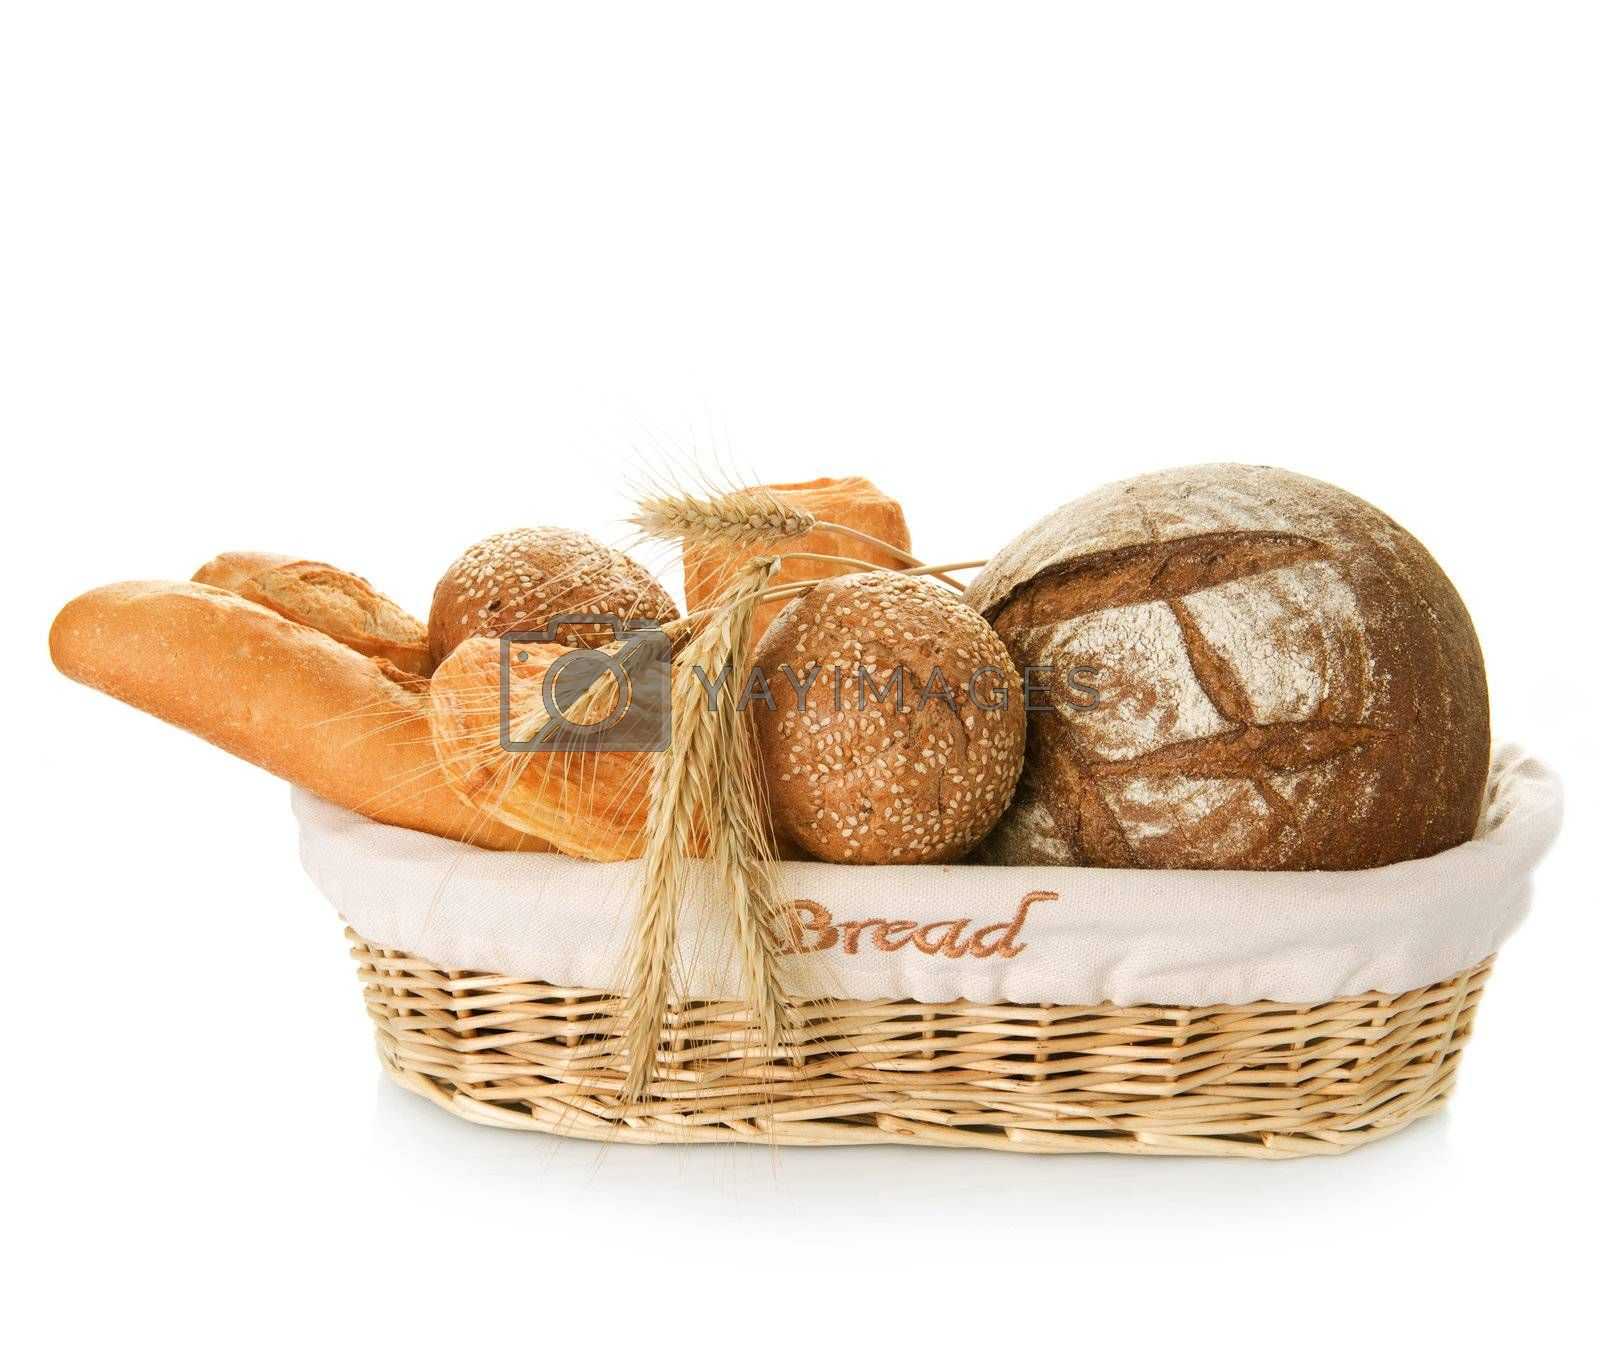 Bakery Bread Over White by Subbotina Anna